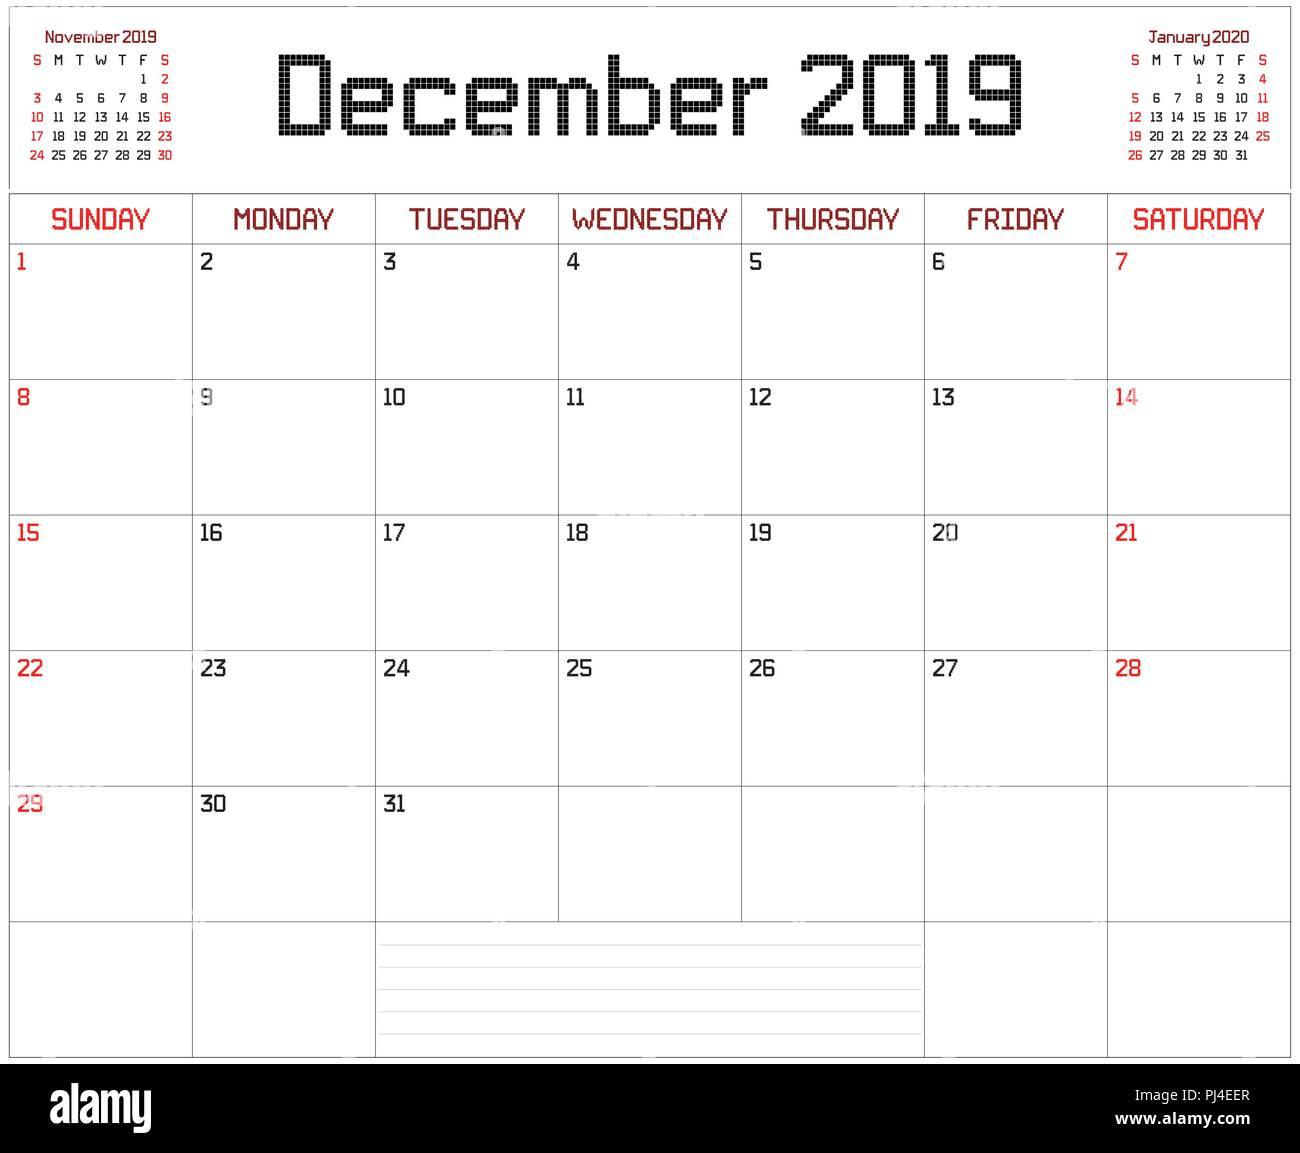 Calendario Mese Dicembre 2019.2019 Dicembre Planner Un Pianificatore Mensile Calendario